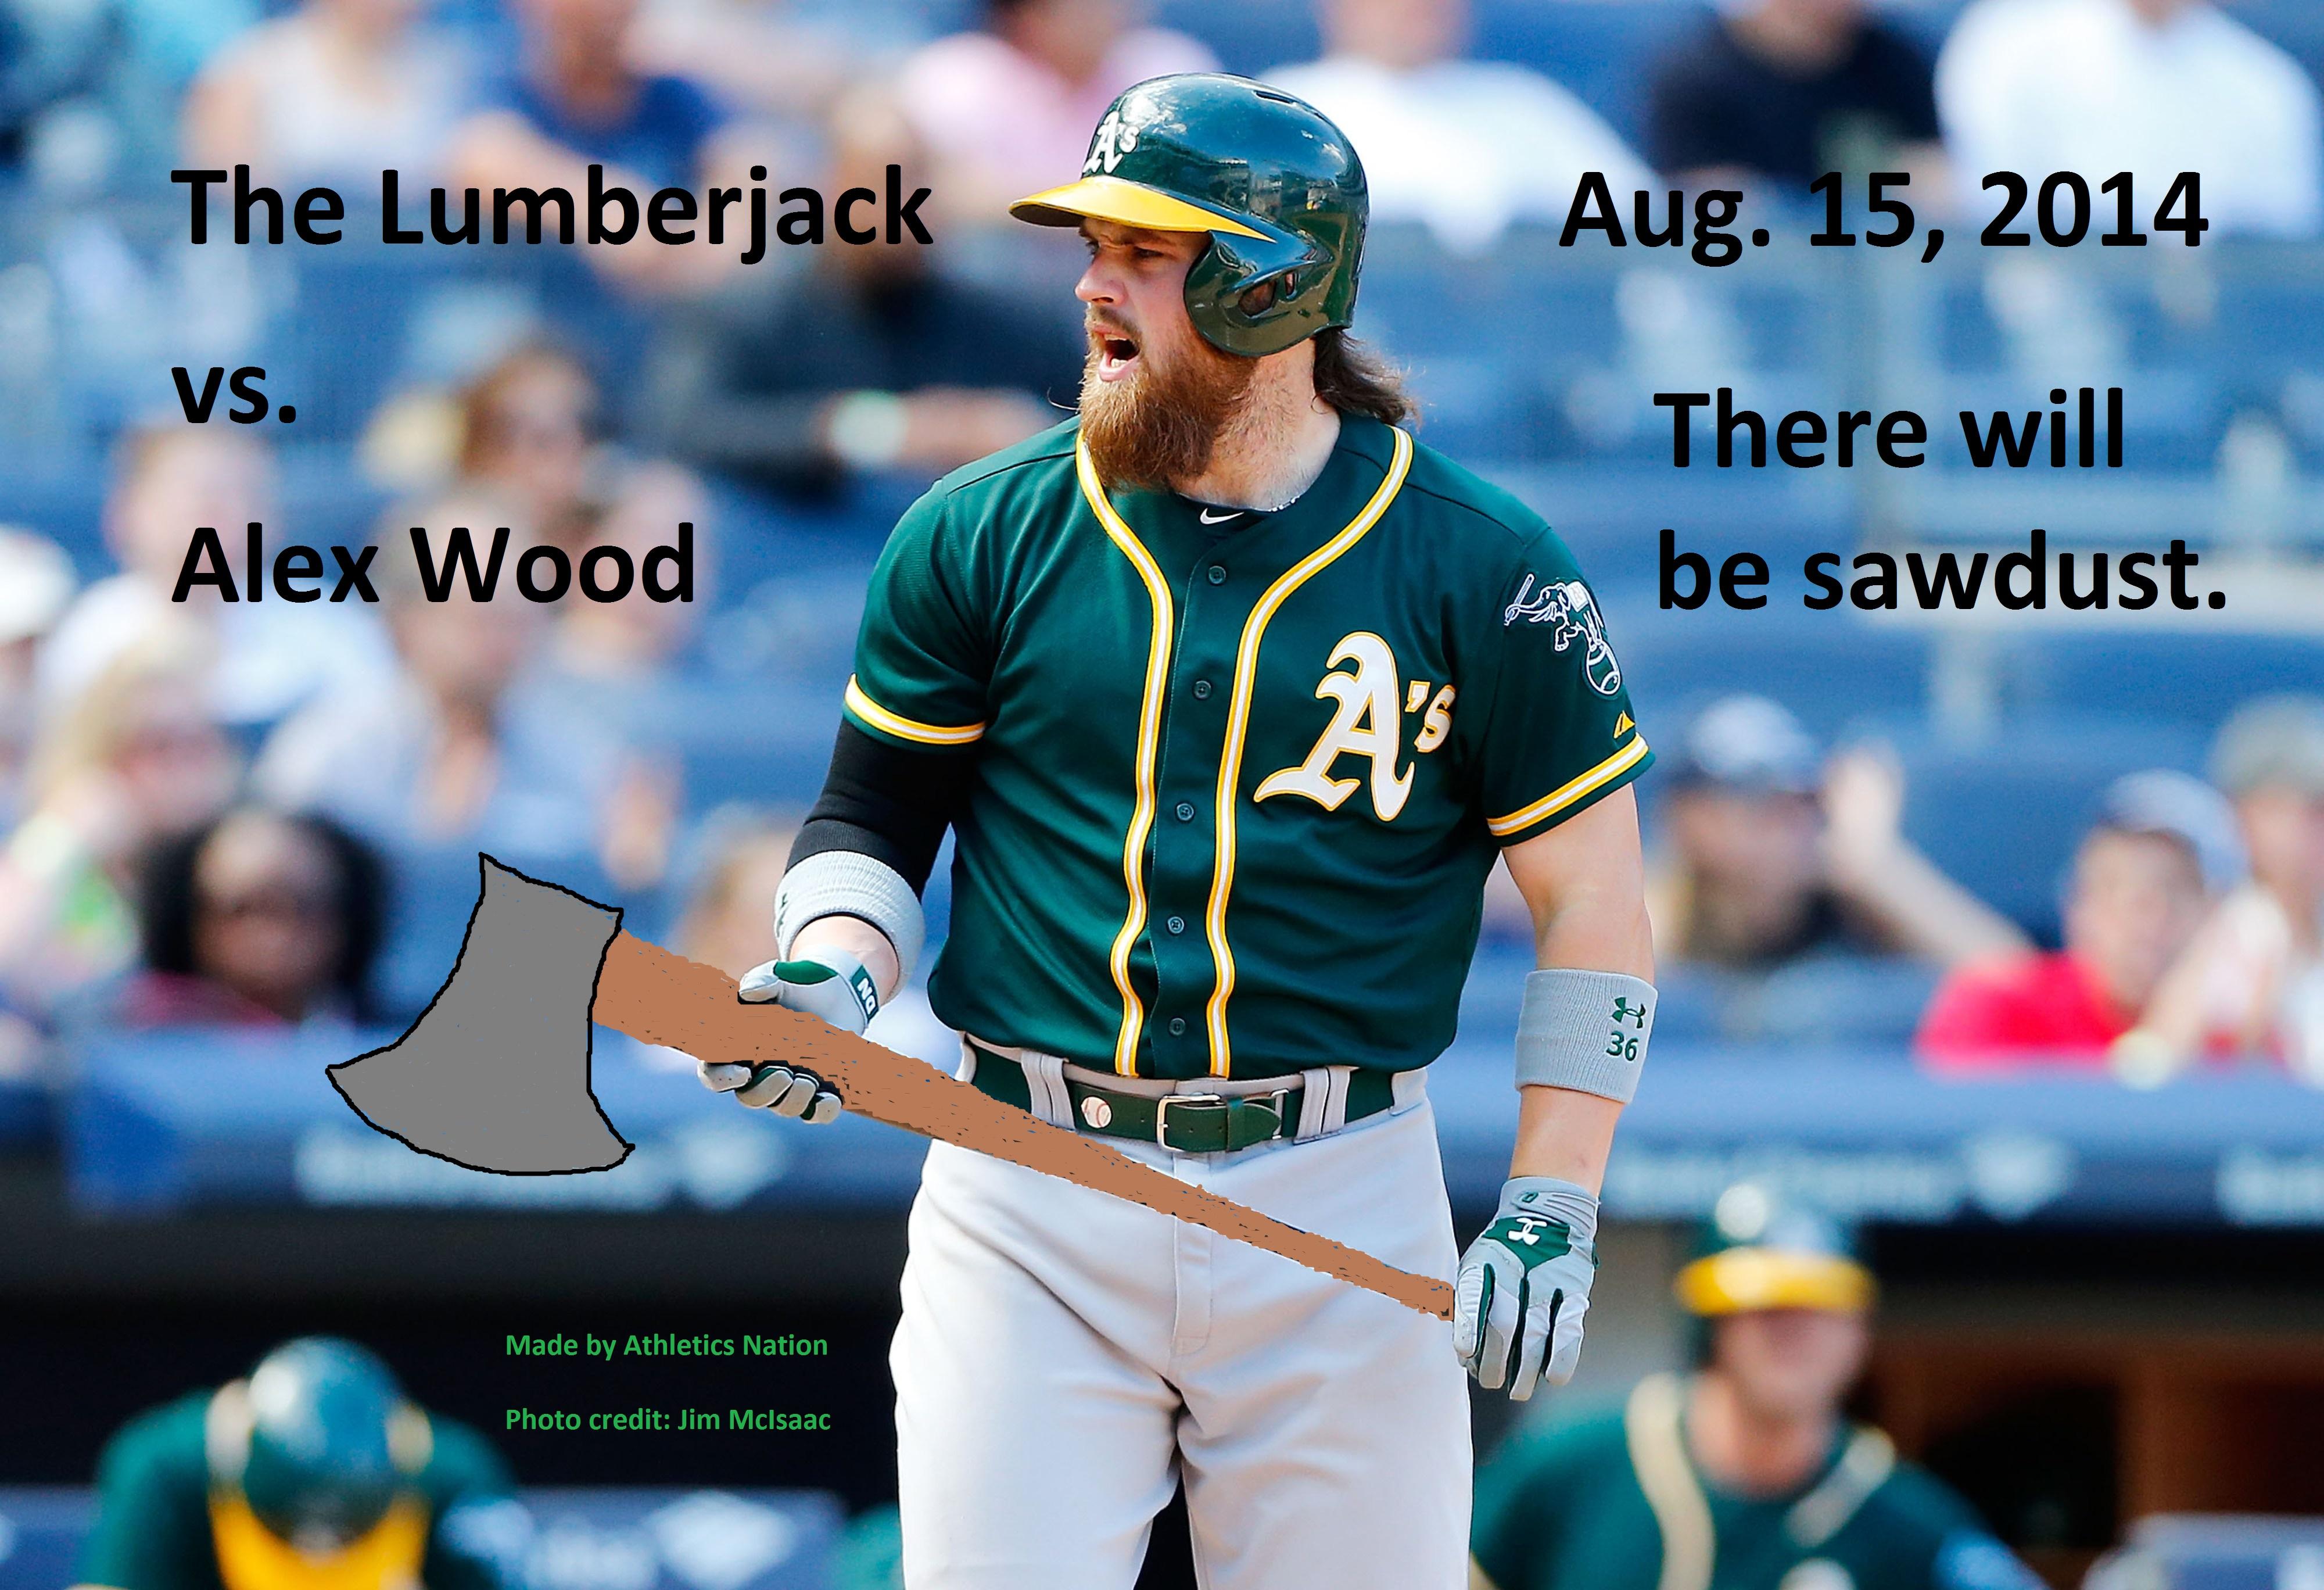 Norris_lumberjack_vs_wood_medium